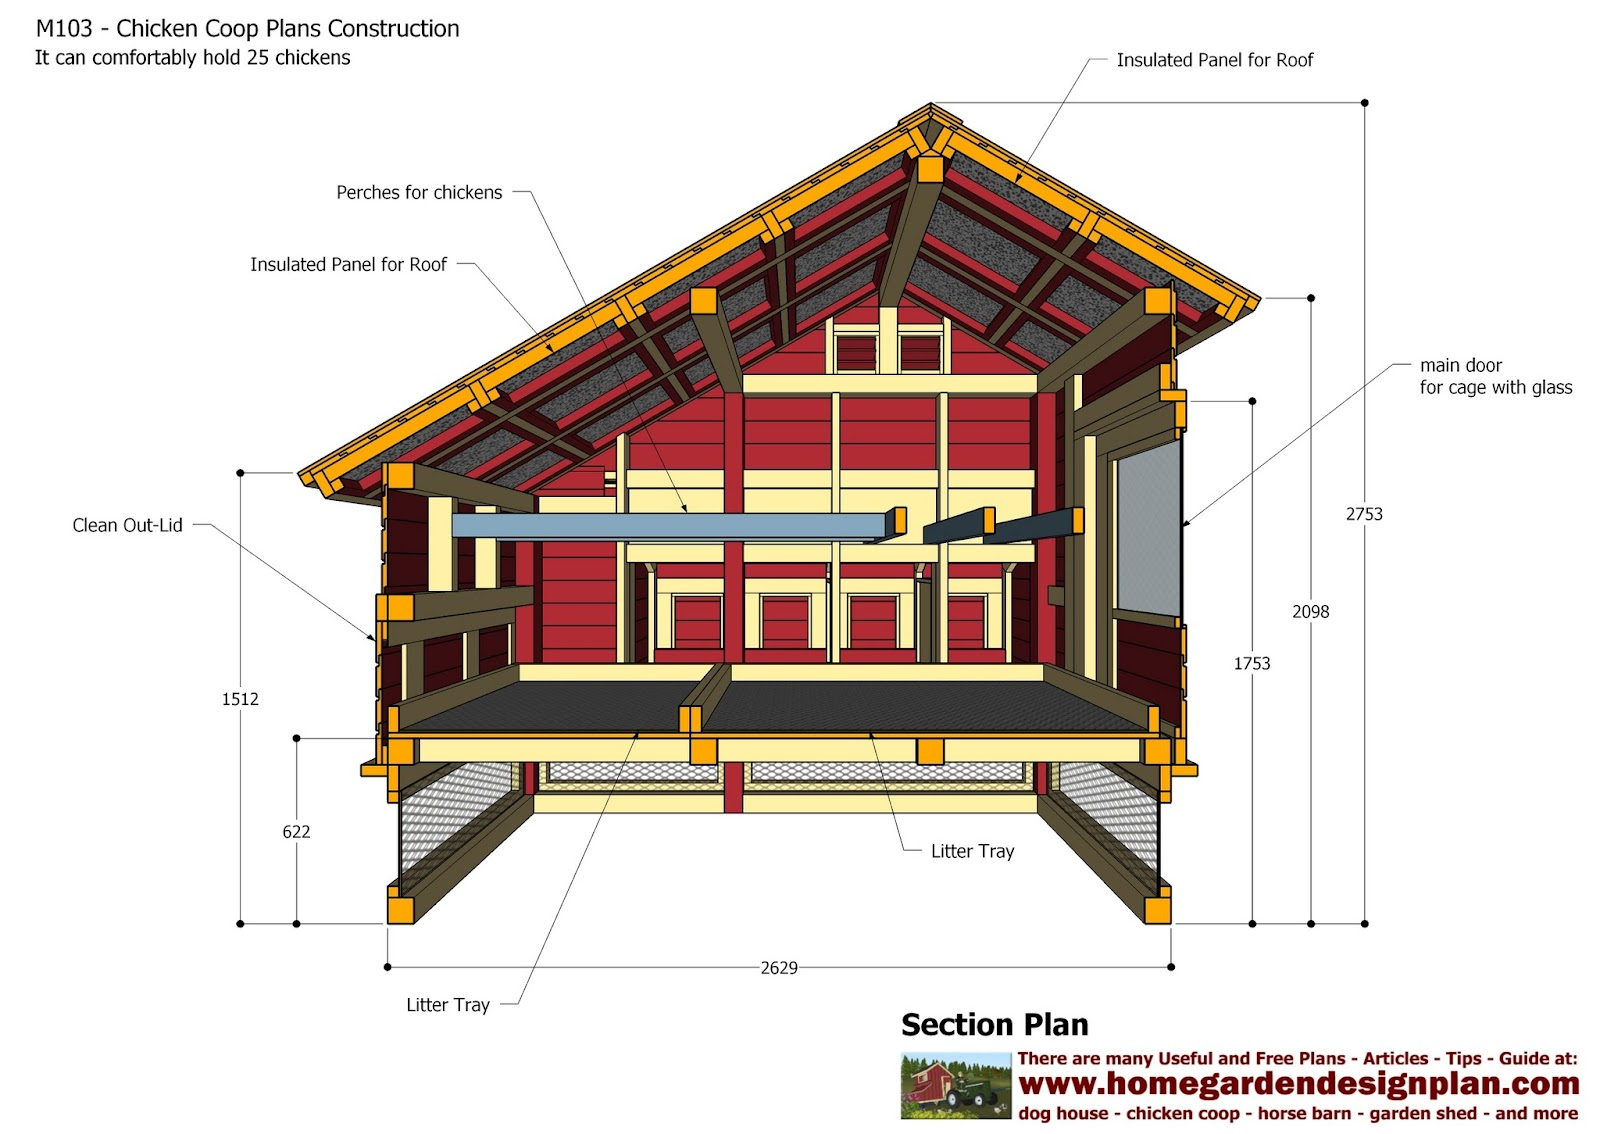 home garden plans: M103 - Chicken Coop Plans Construction ...